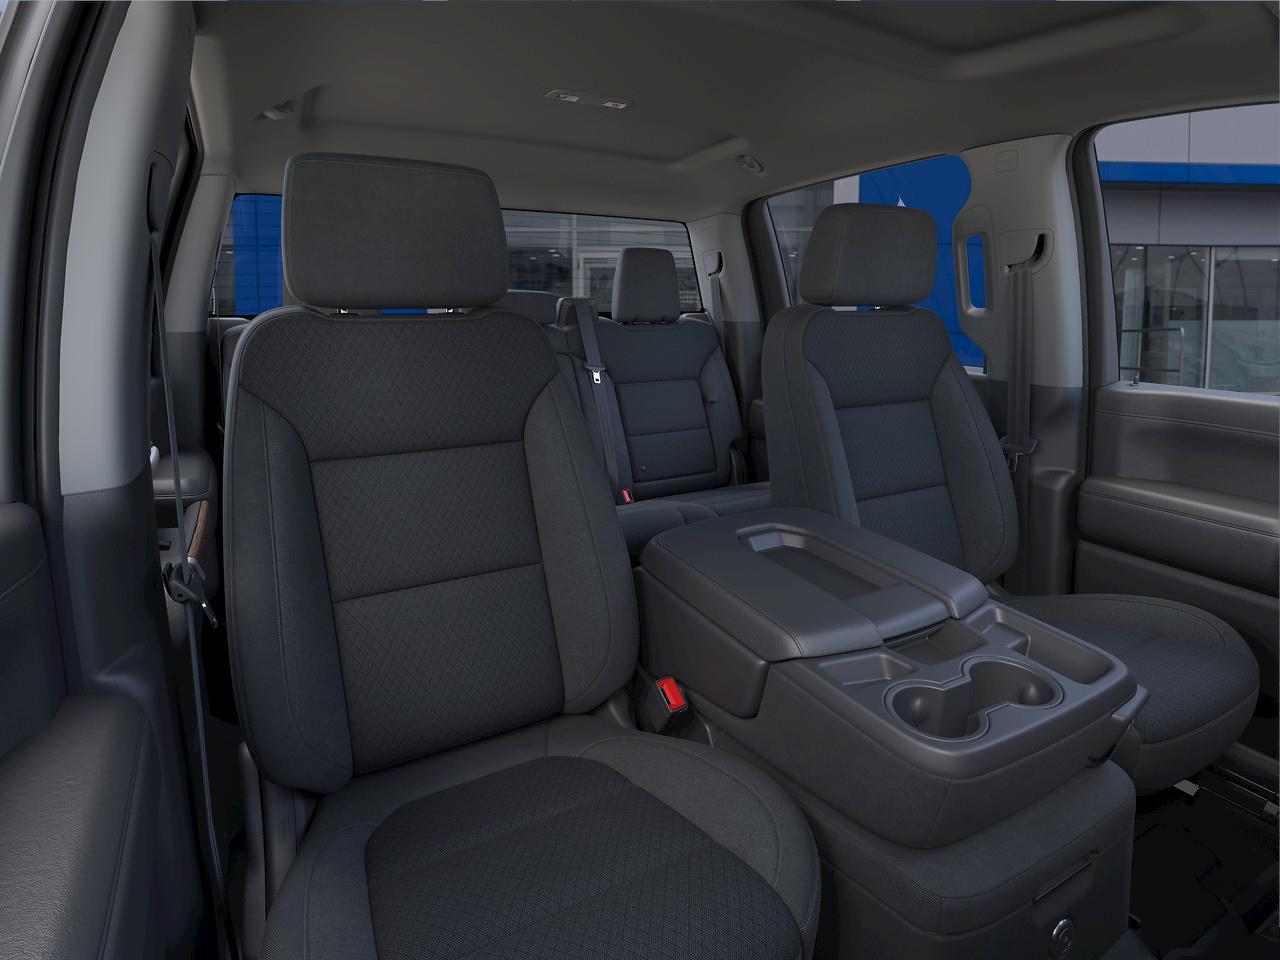 2021 Chevrolet Silverado 2500 Crew Cab 4x4, Pickup #M1387 - photo 13